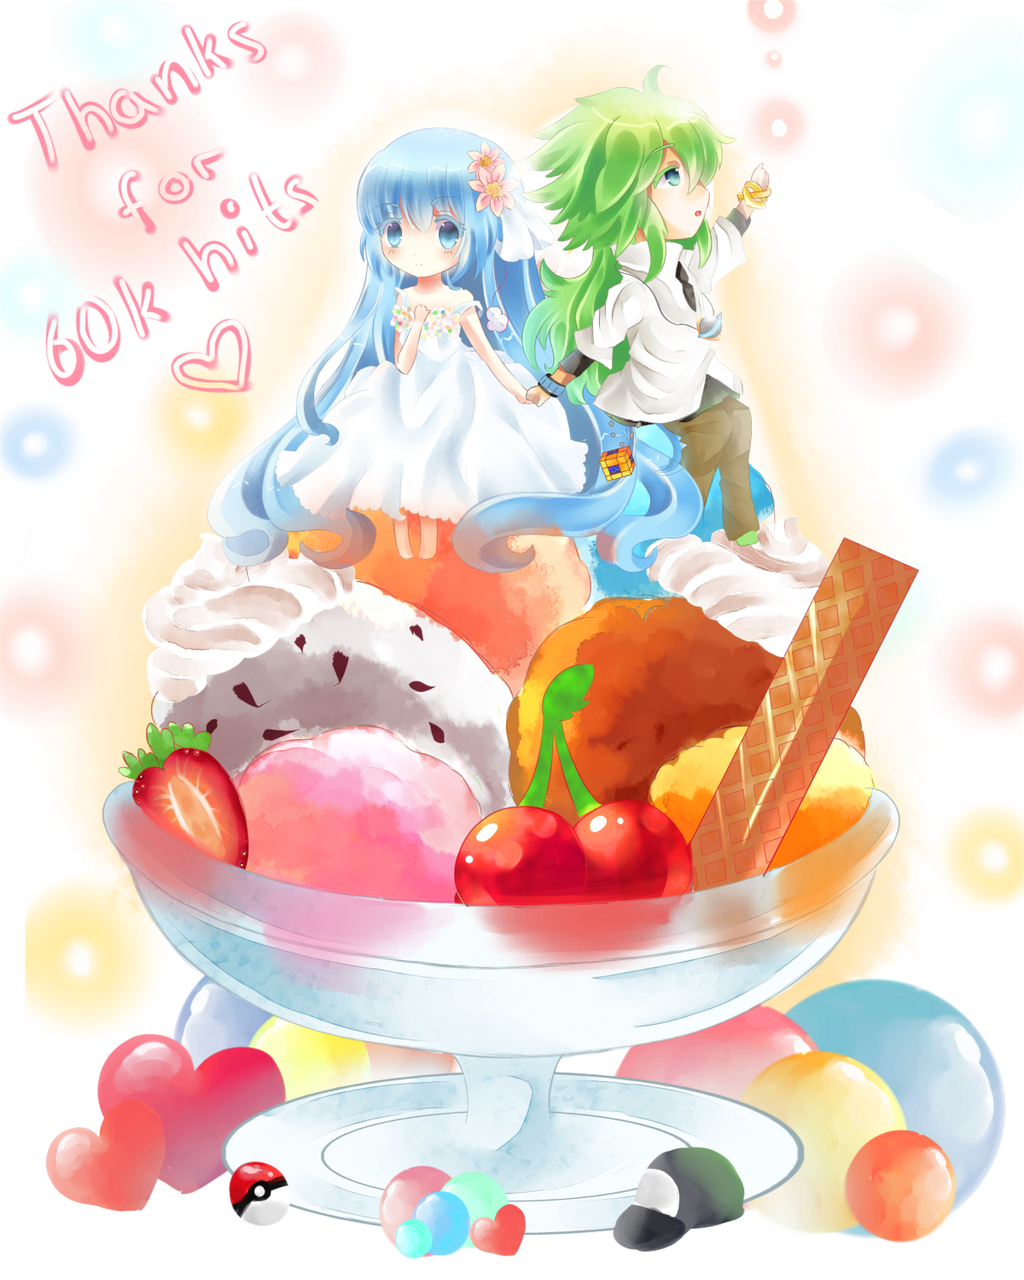 Big sundae by Maruuki